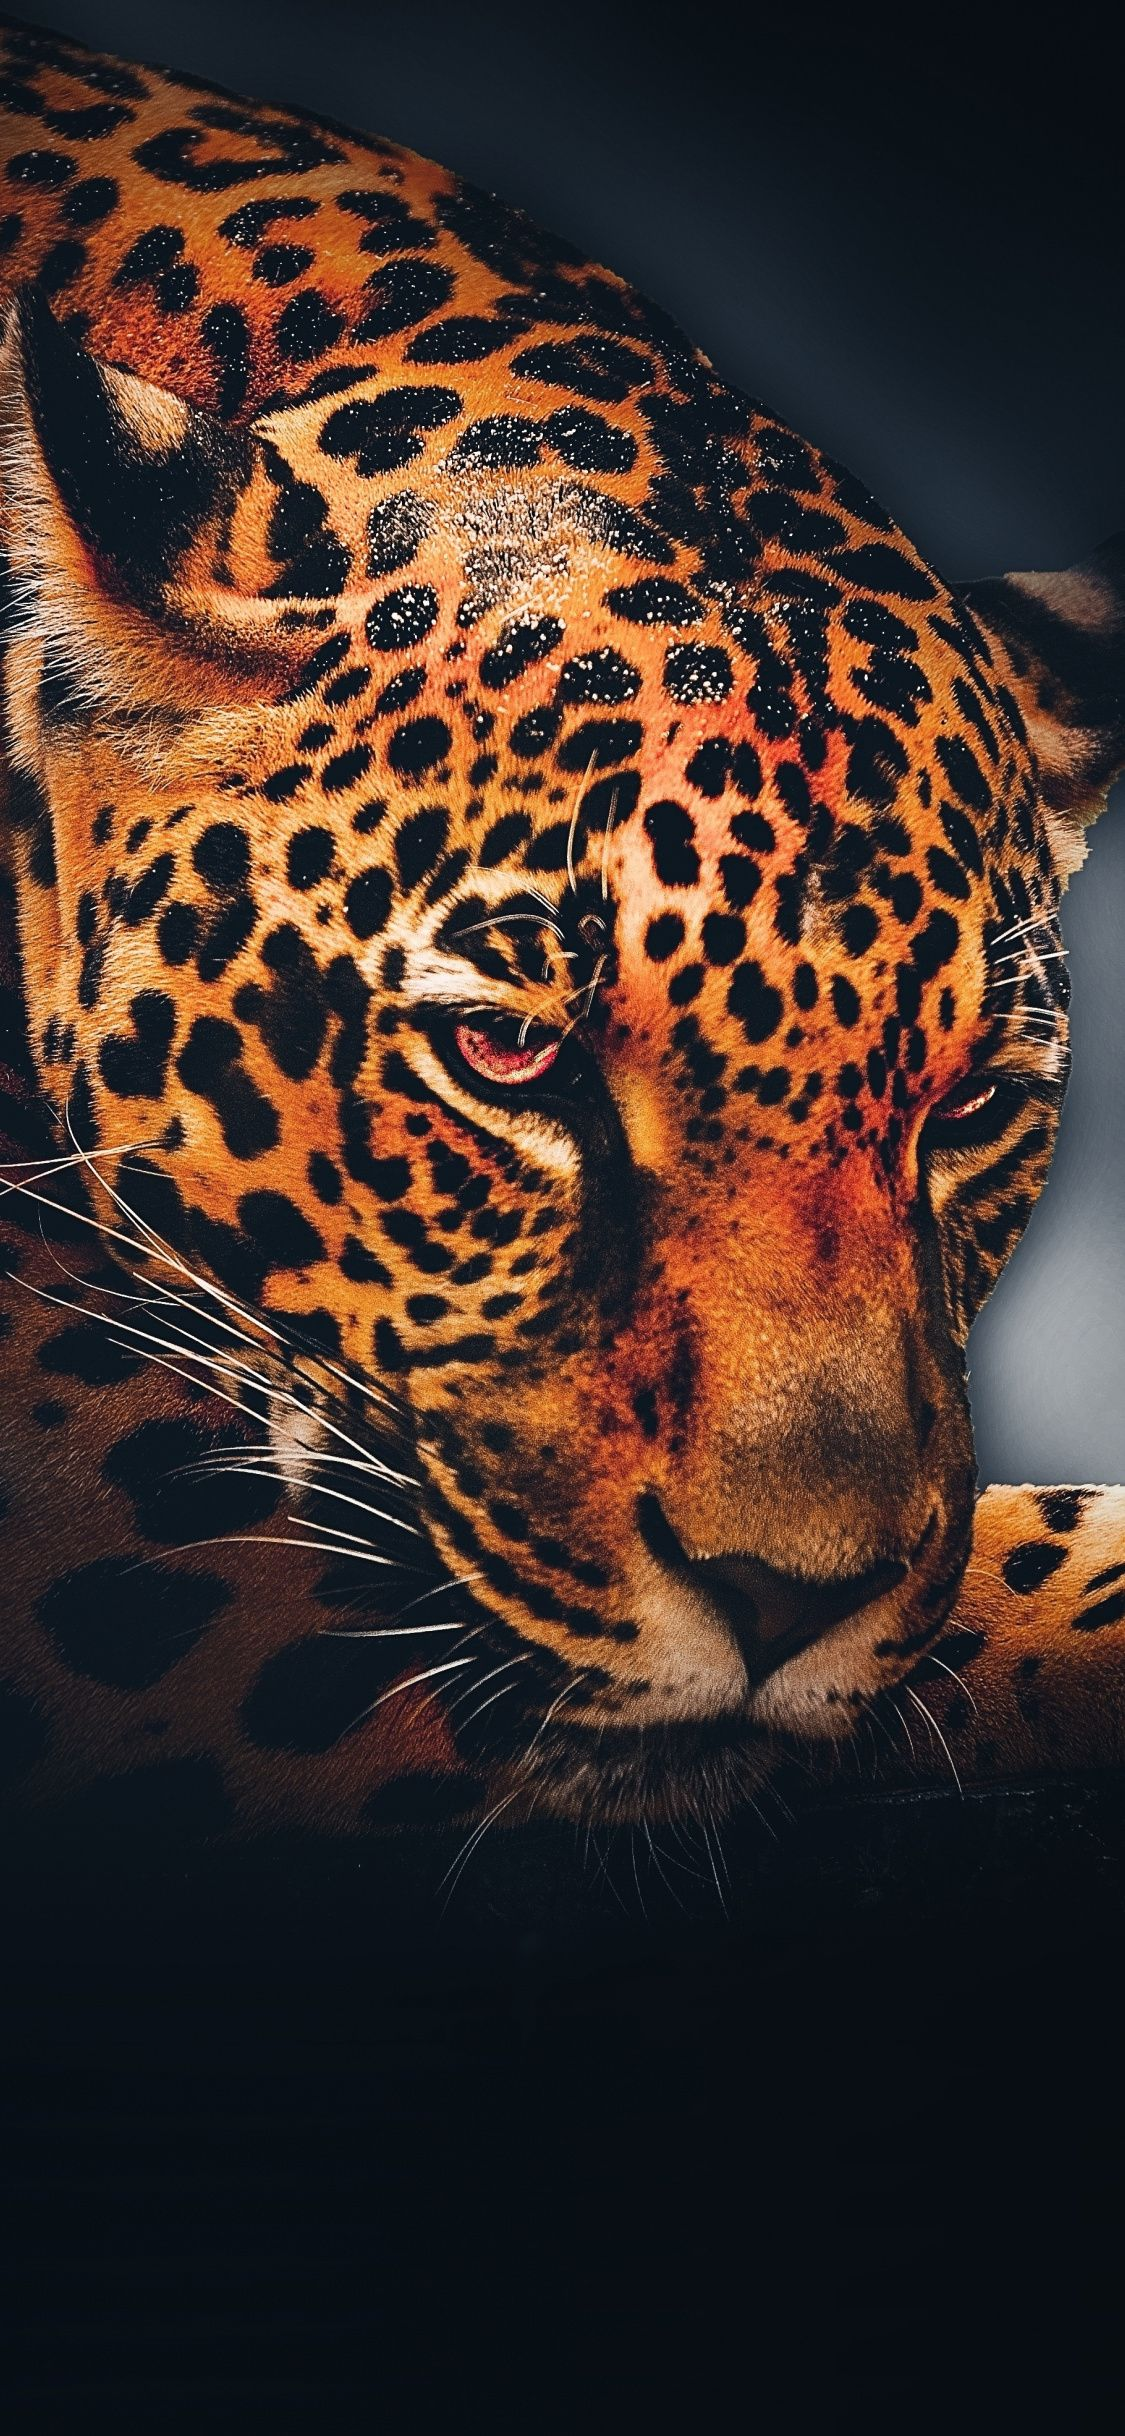 1125x2436 Leopard Animal Relaxed Portrait Wallpaper Leopard Wallpaper Animal Wallpaper Wild Animal Wallpaper